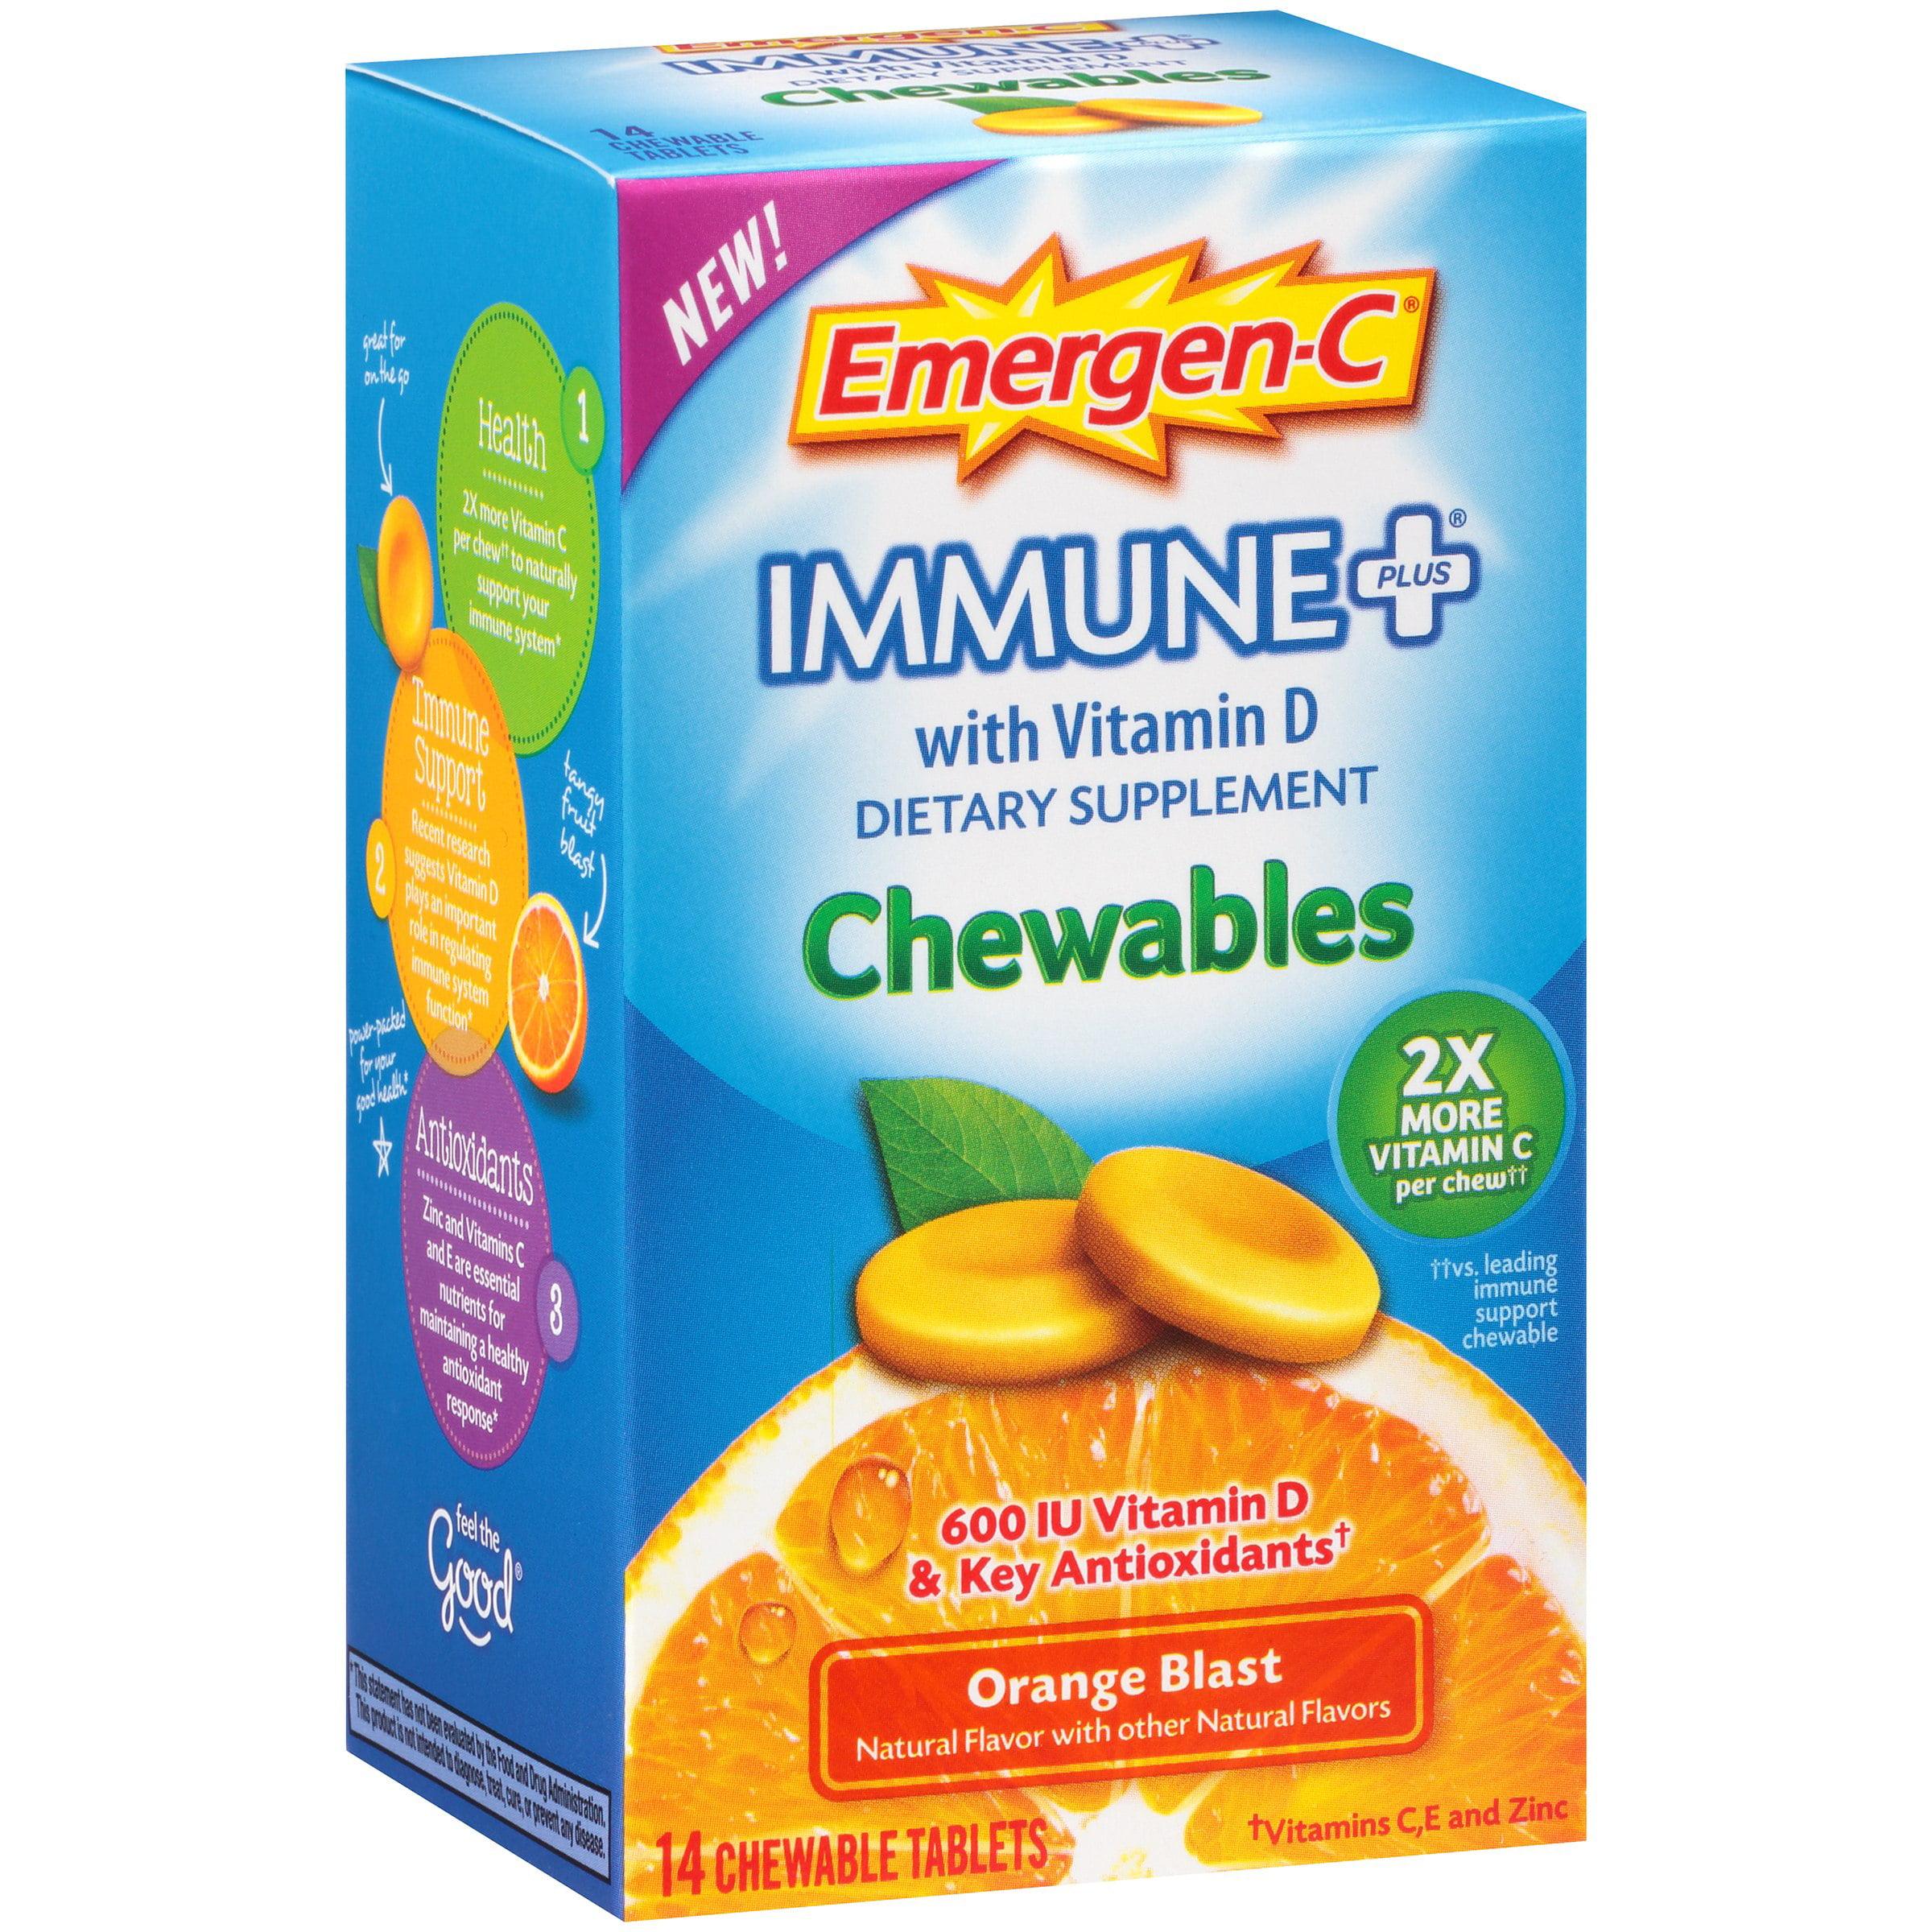 (12 Pack) Emergen-C Immune+ Chewables (14 Count, Orange Blast Flavor) Dietary Supplement Tablet With 600 IU Vitamin D, 500mg Vitamin C